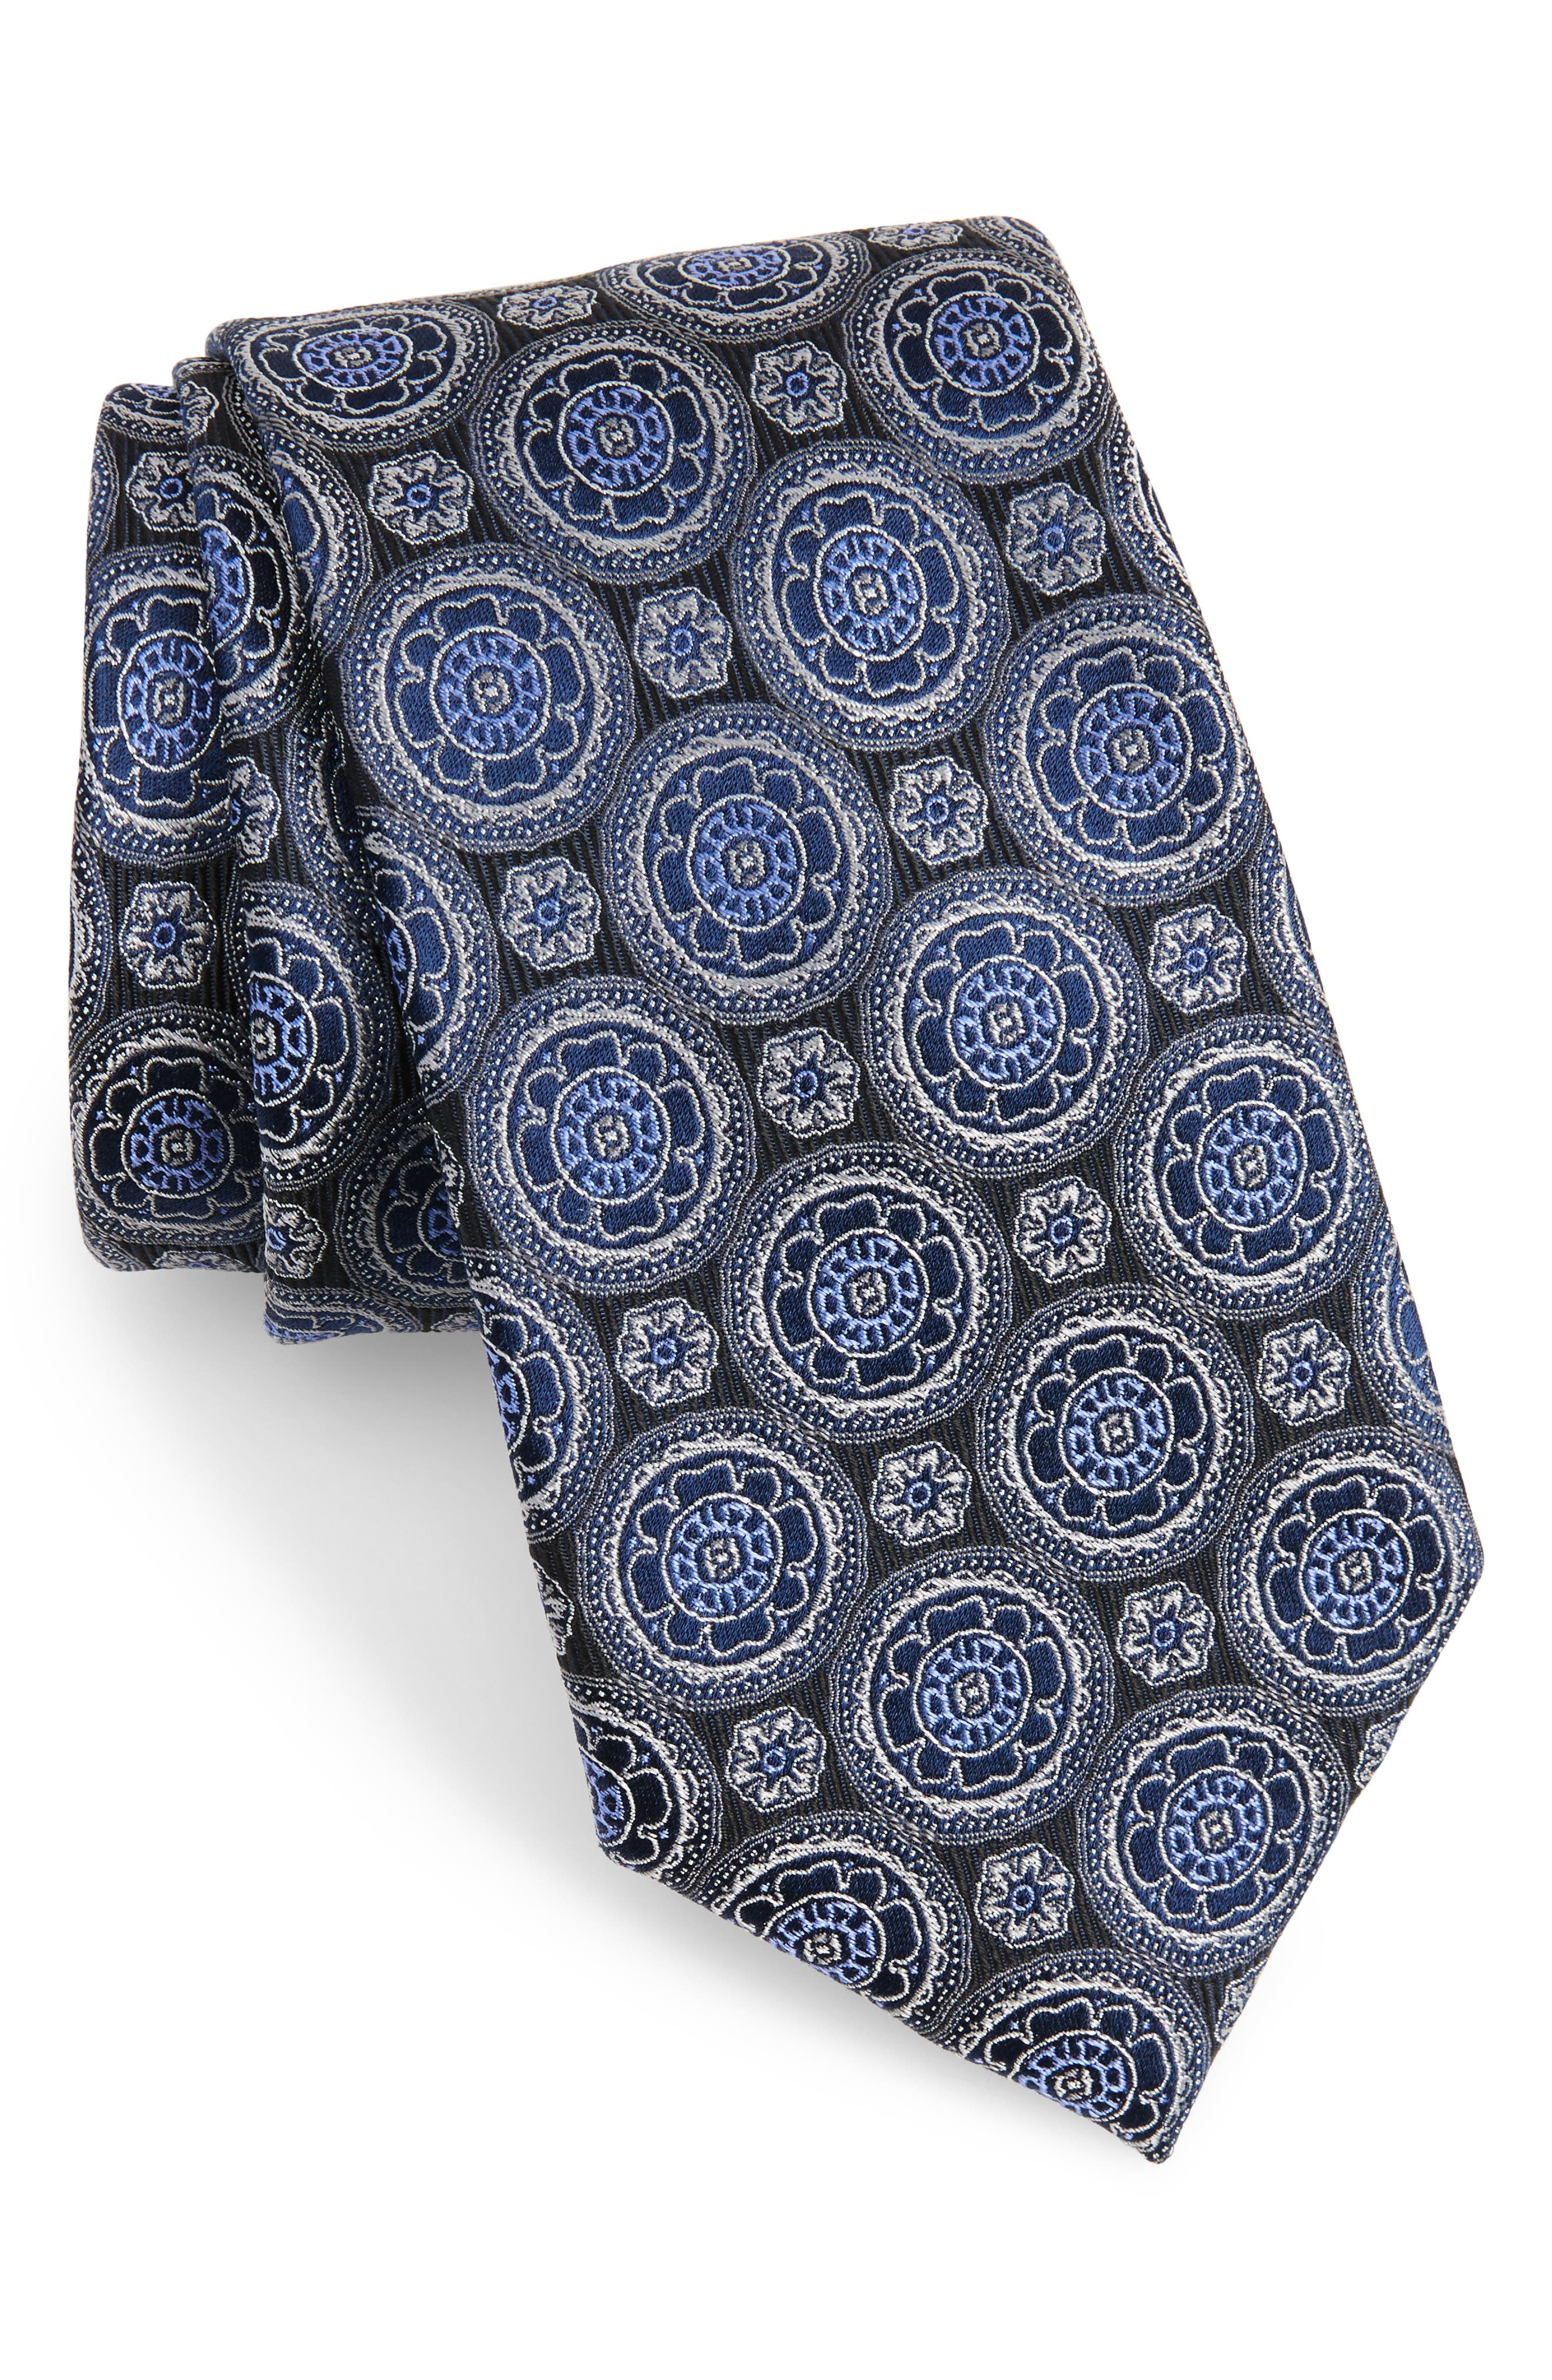 Kensington Medallion Silk Tie,                             Main thumbnail 1, color,                             001